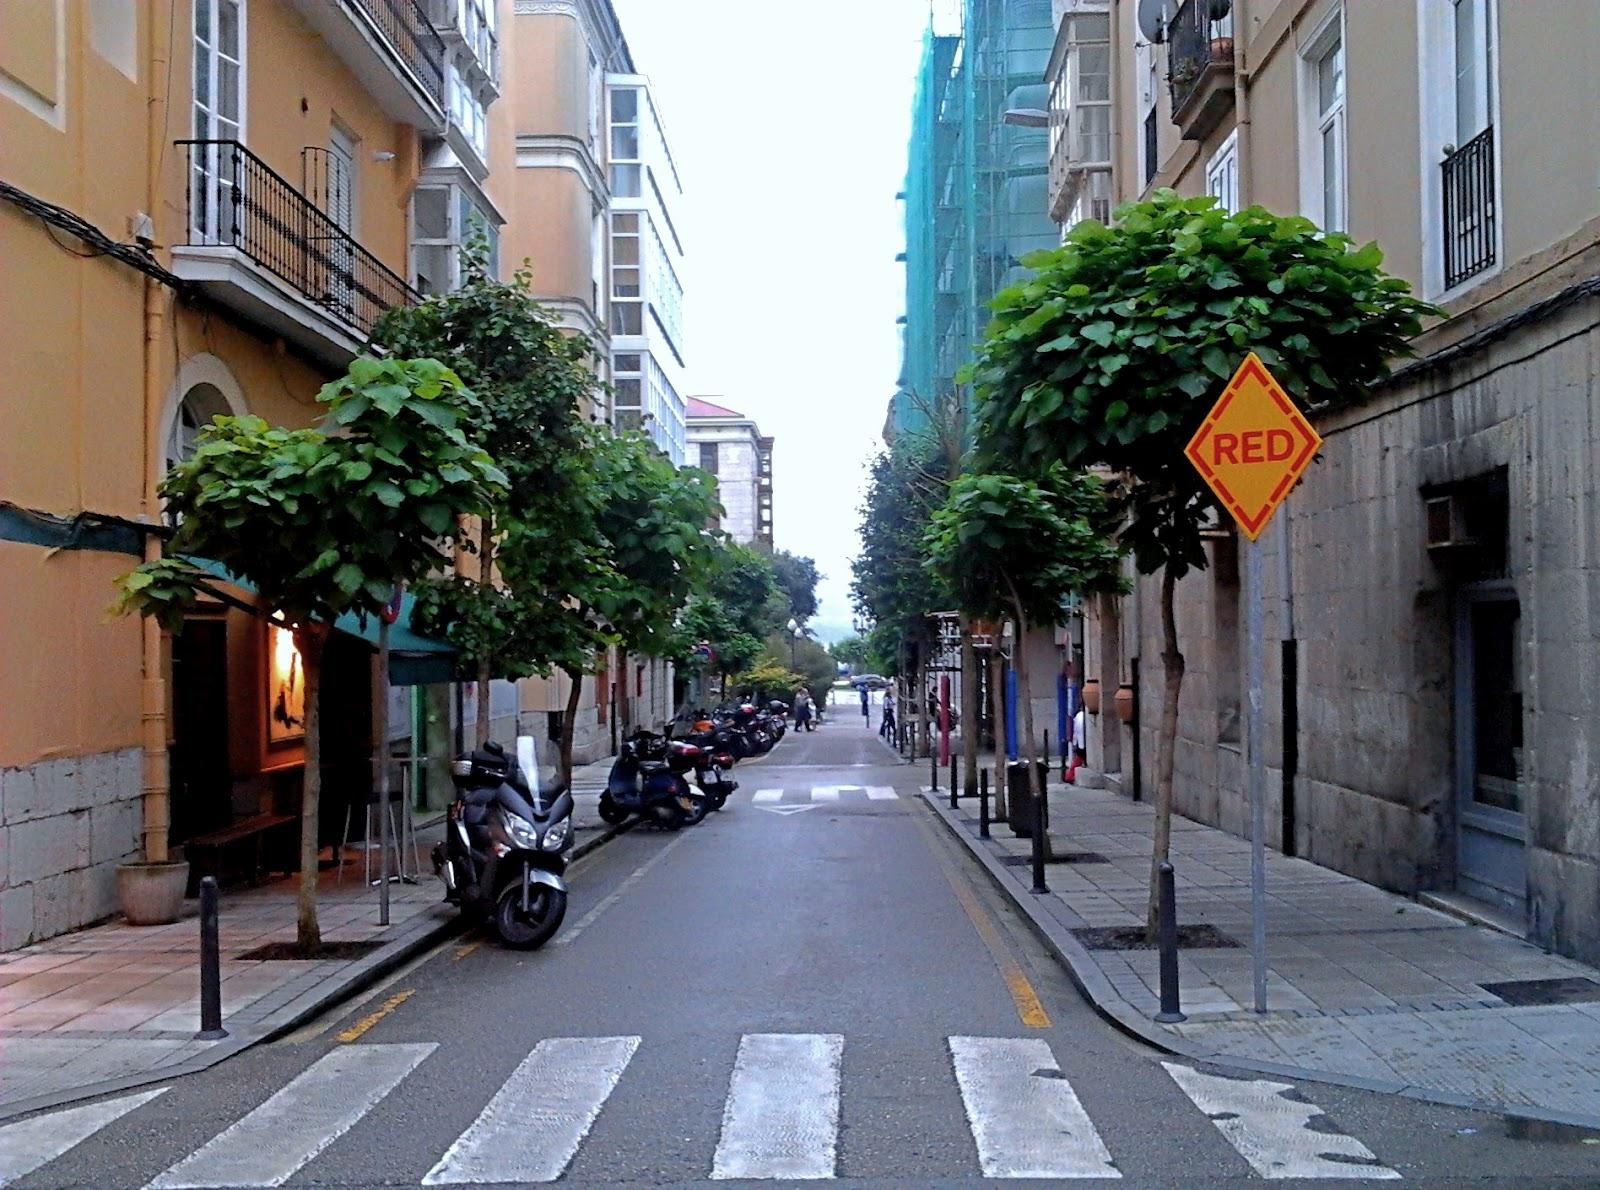 Paseo por la calle en brasil 7 - 2 7